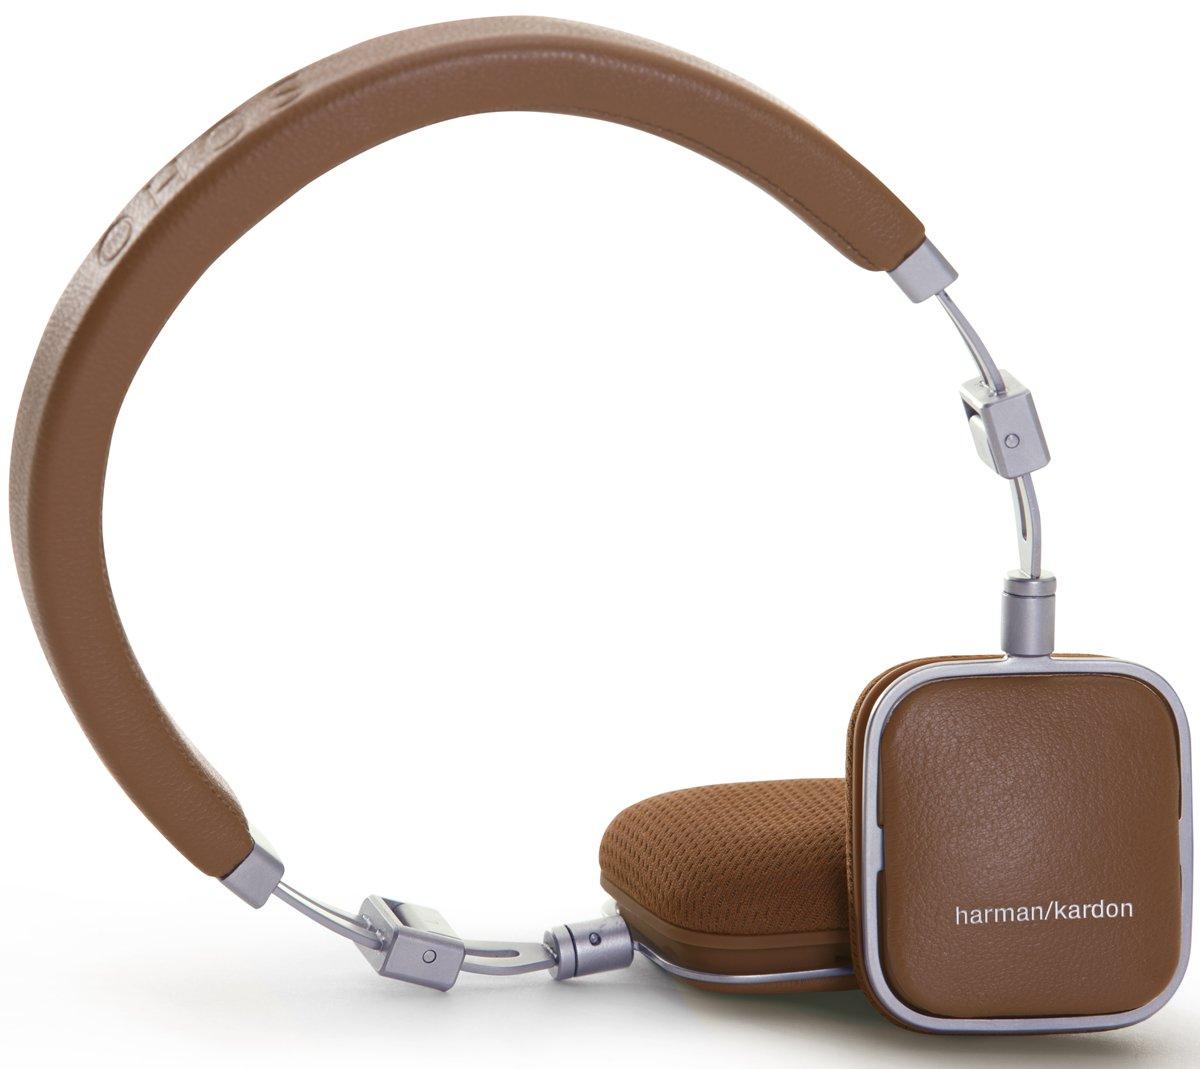 harman kardon in ear headphones. harman kardon hksohoabeg soho-a on-ear headphones in ear g